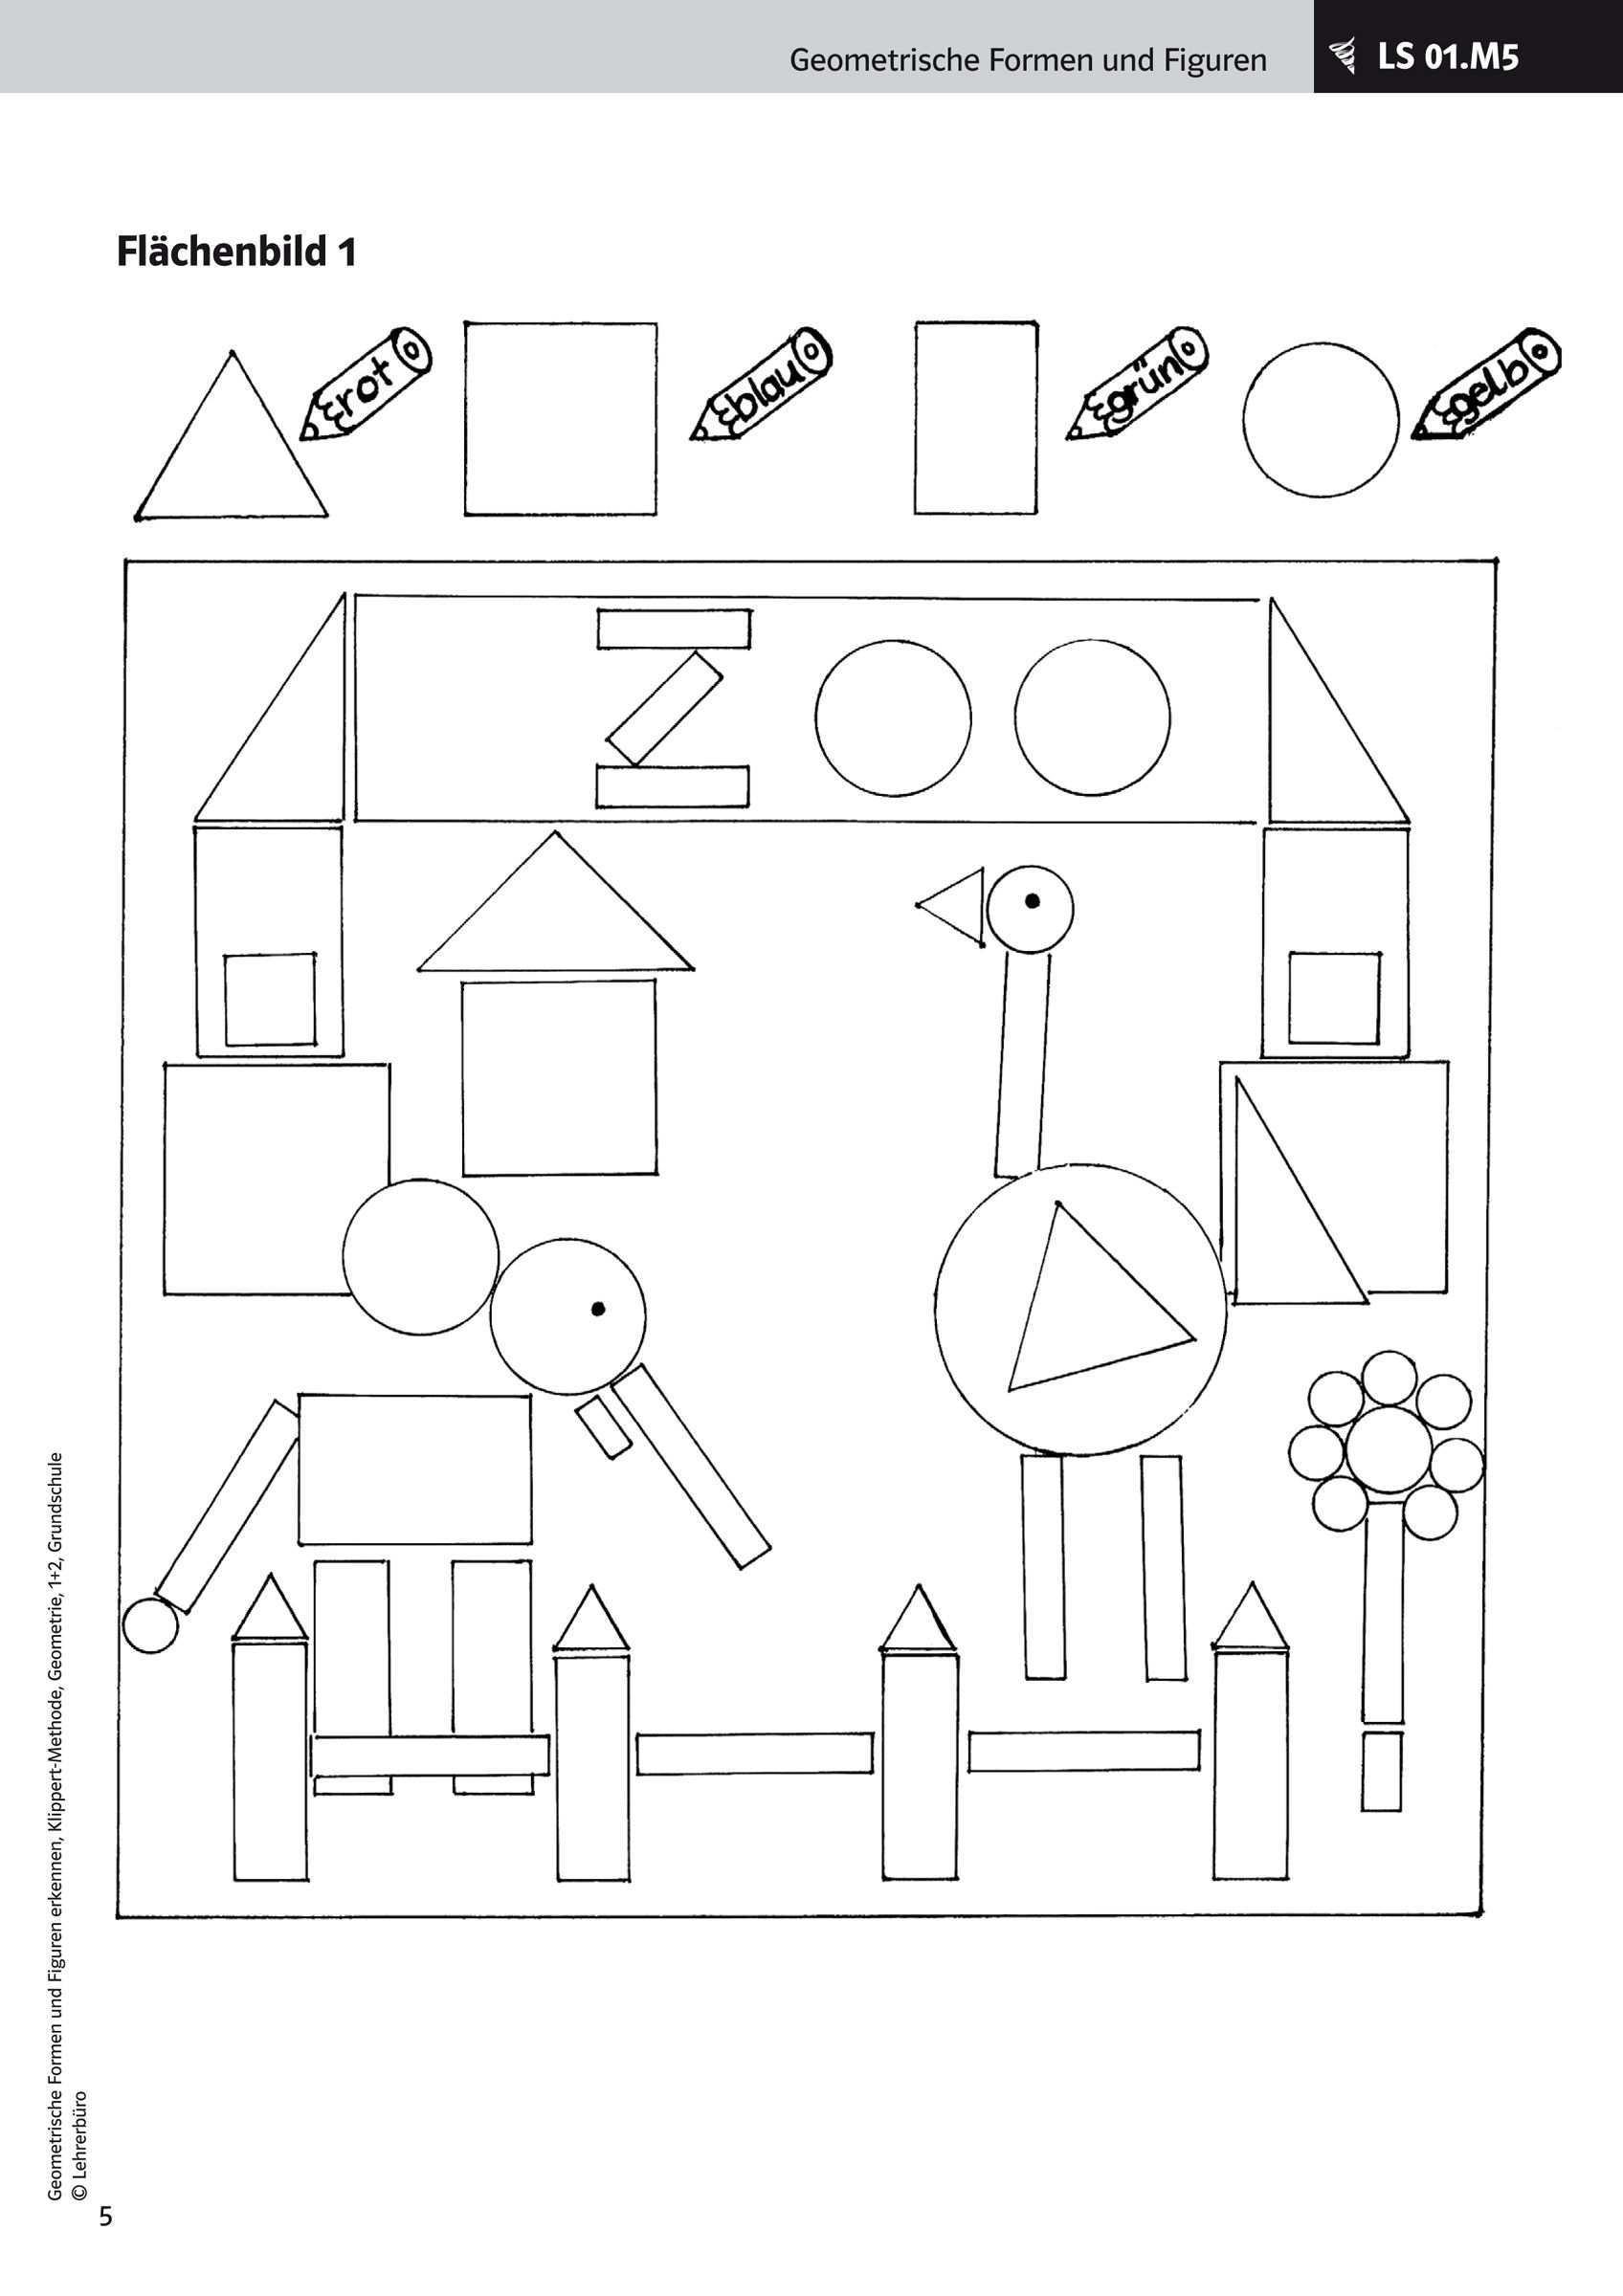 Bildergebnis Fur Geometrische Formen 1 Klasse Arbeitsblatter Arbeitsblatter Grundschule Formen Vorschule Arbeitsblatter